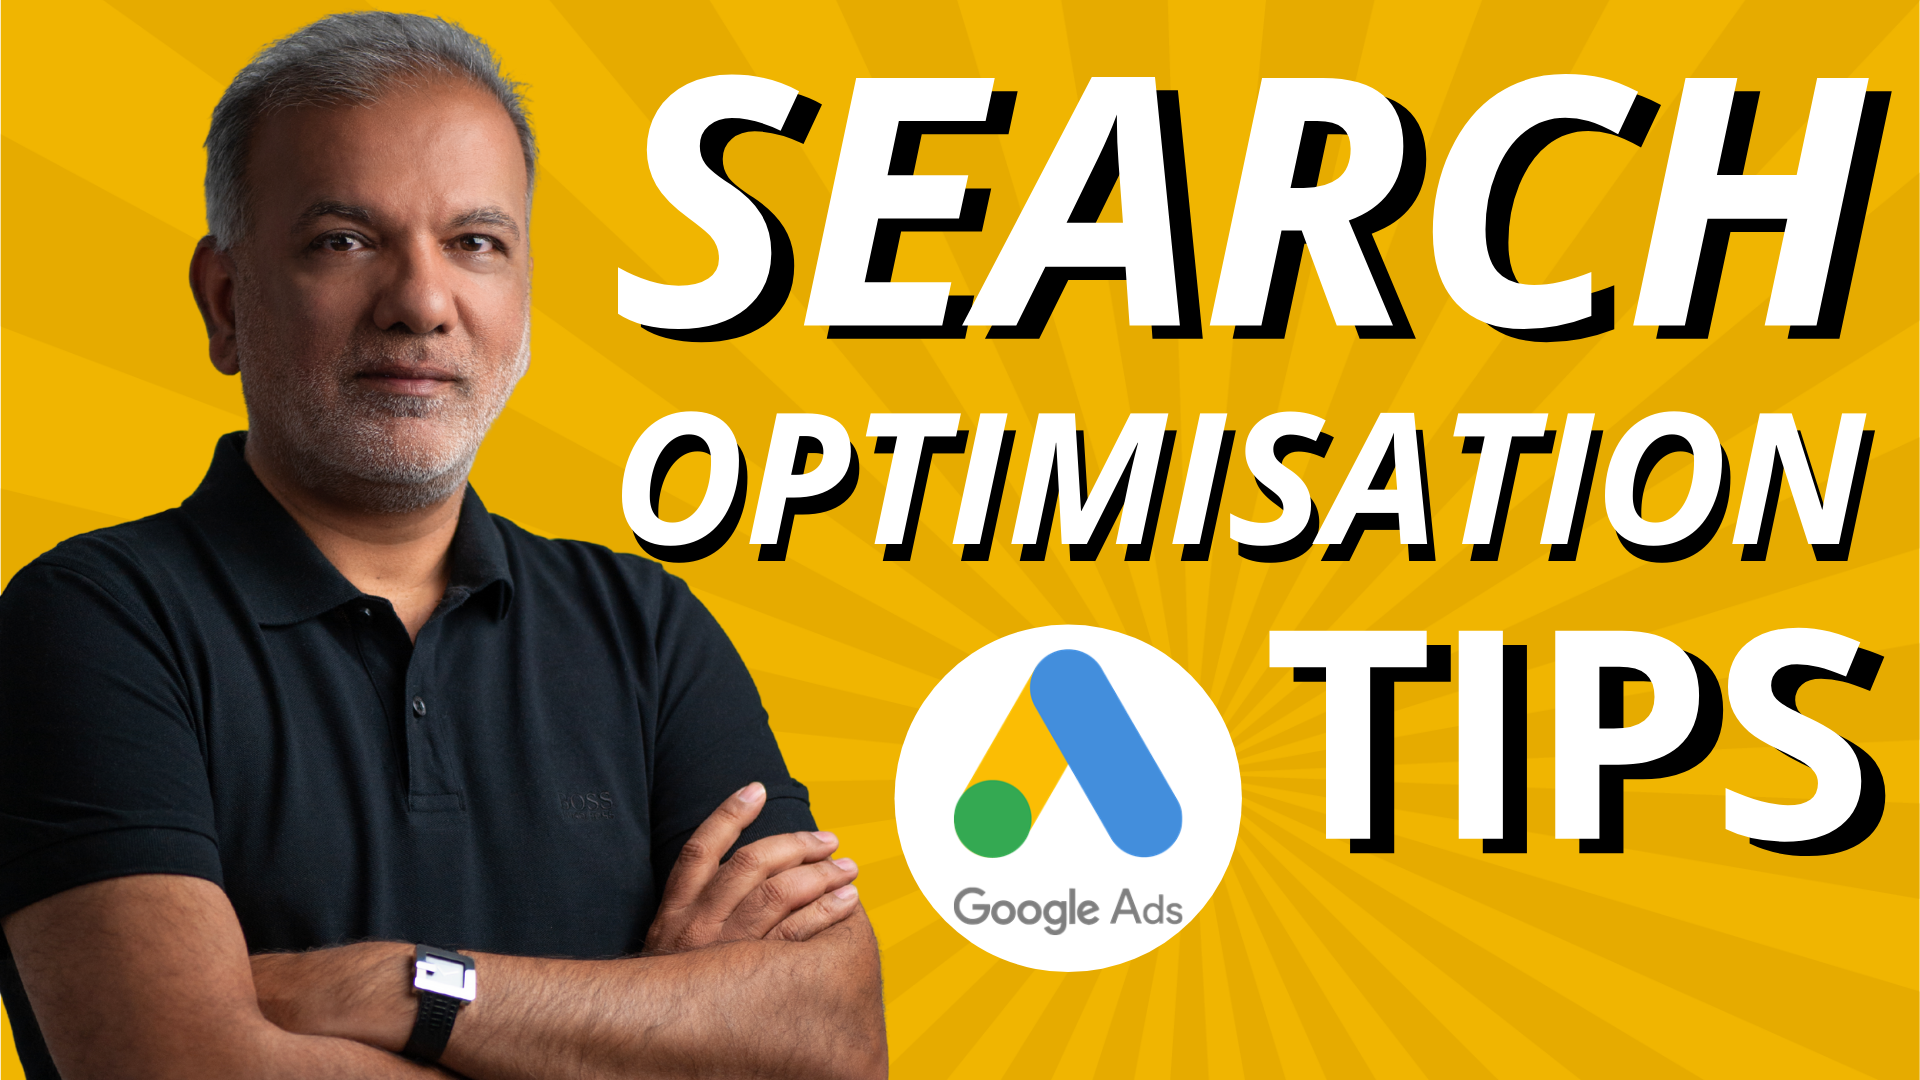 Top 5 Google Ads Optimization Tips